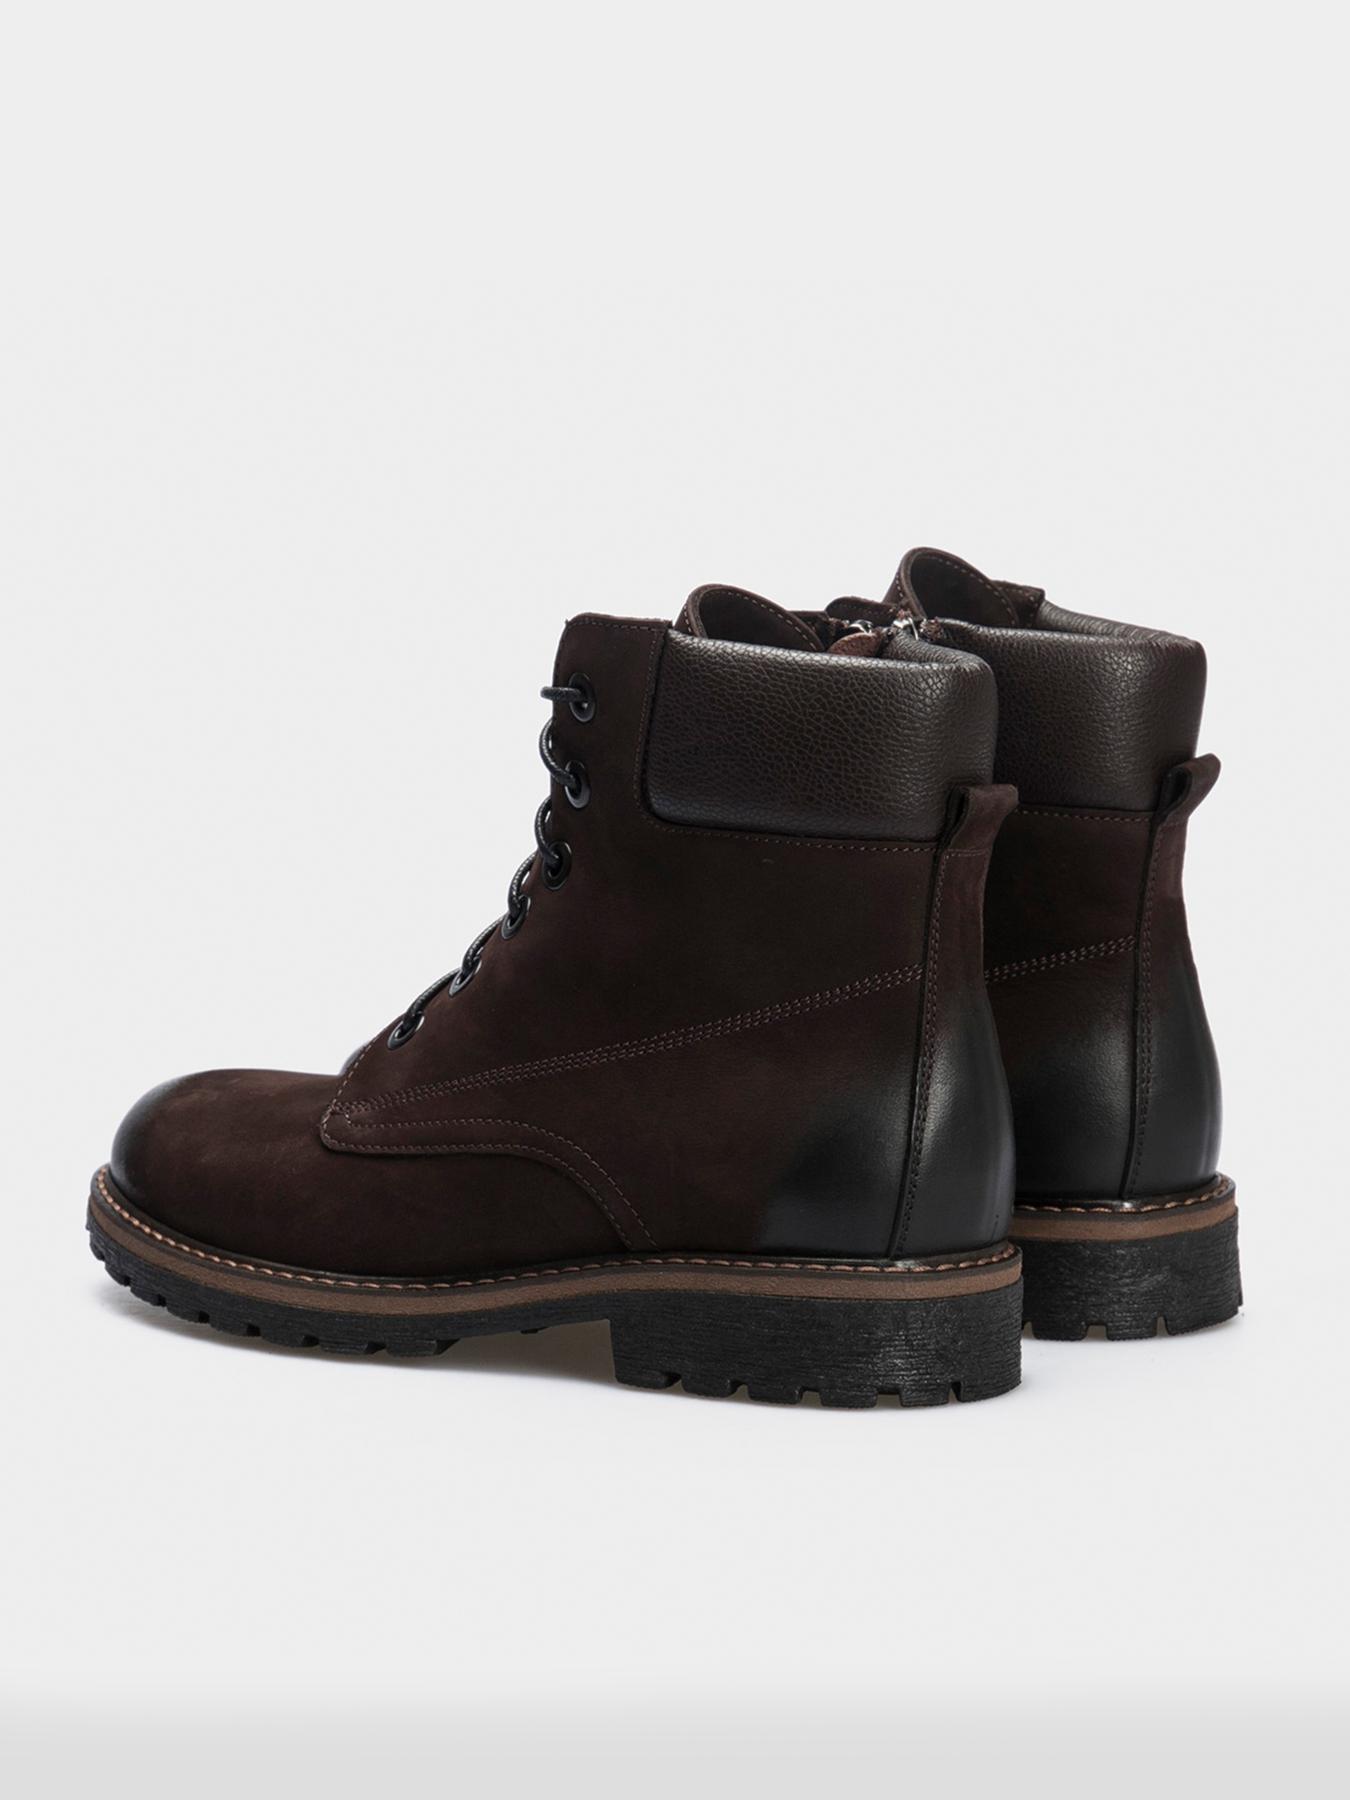 Черевики  жіночі Ботинки 874826631 коричневая кожа/нубук. Шерсть 874826631 продаж, 2017